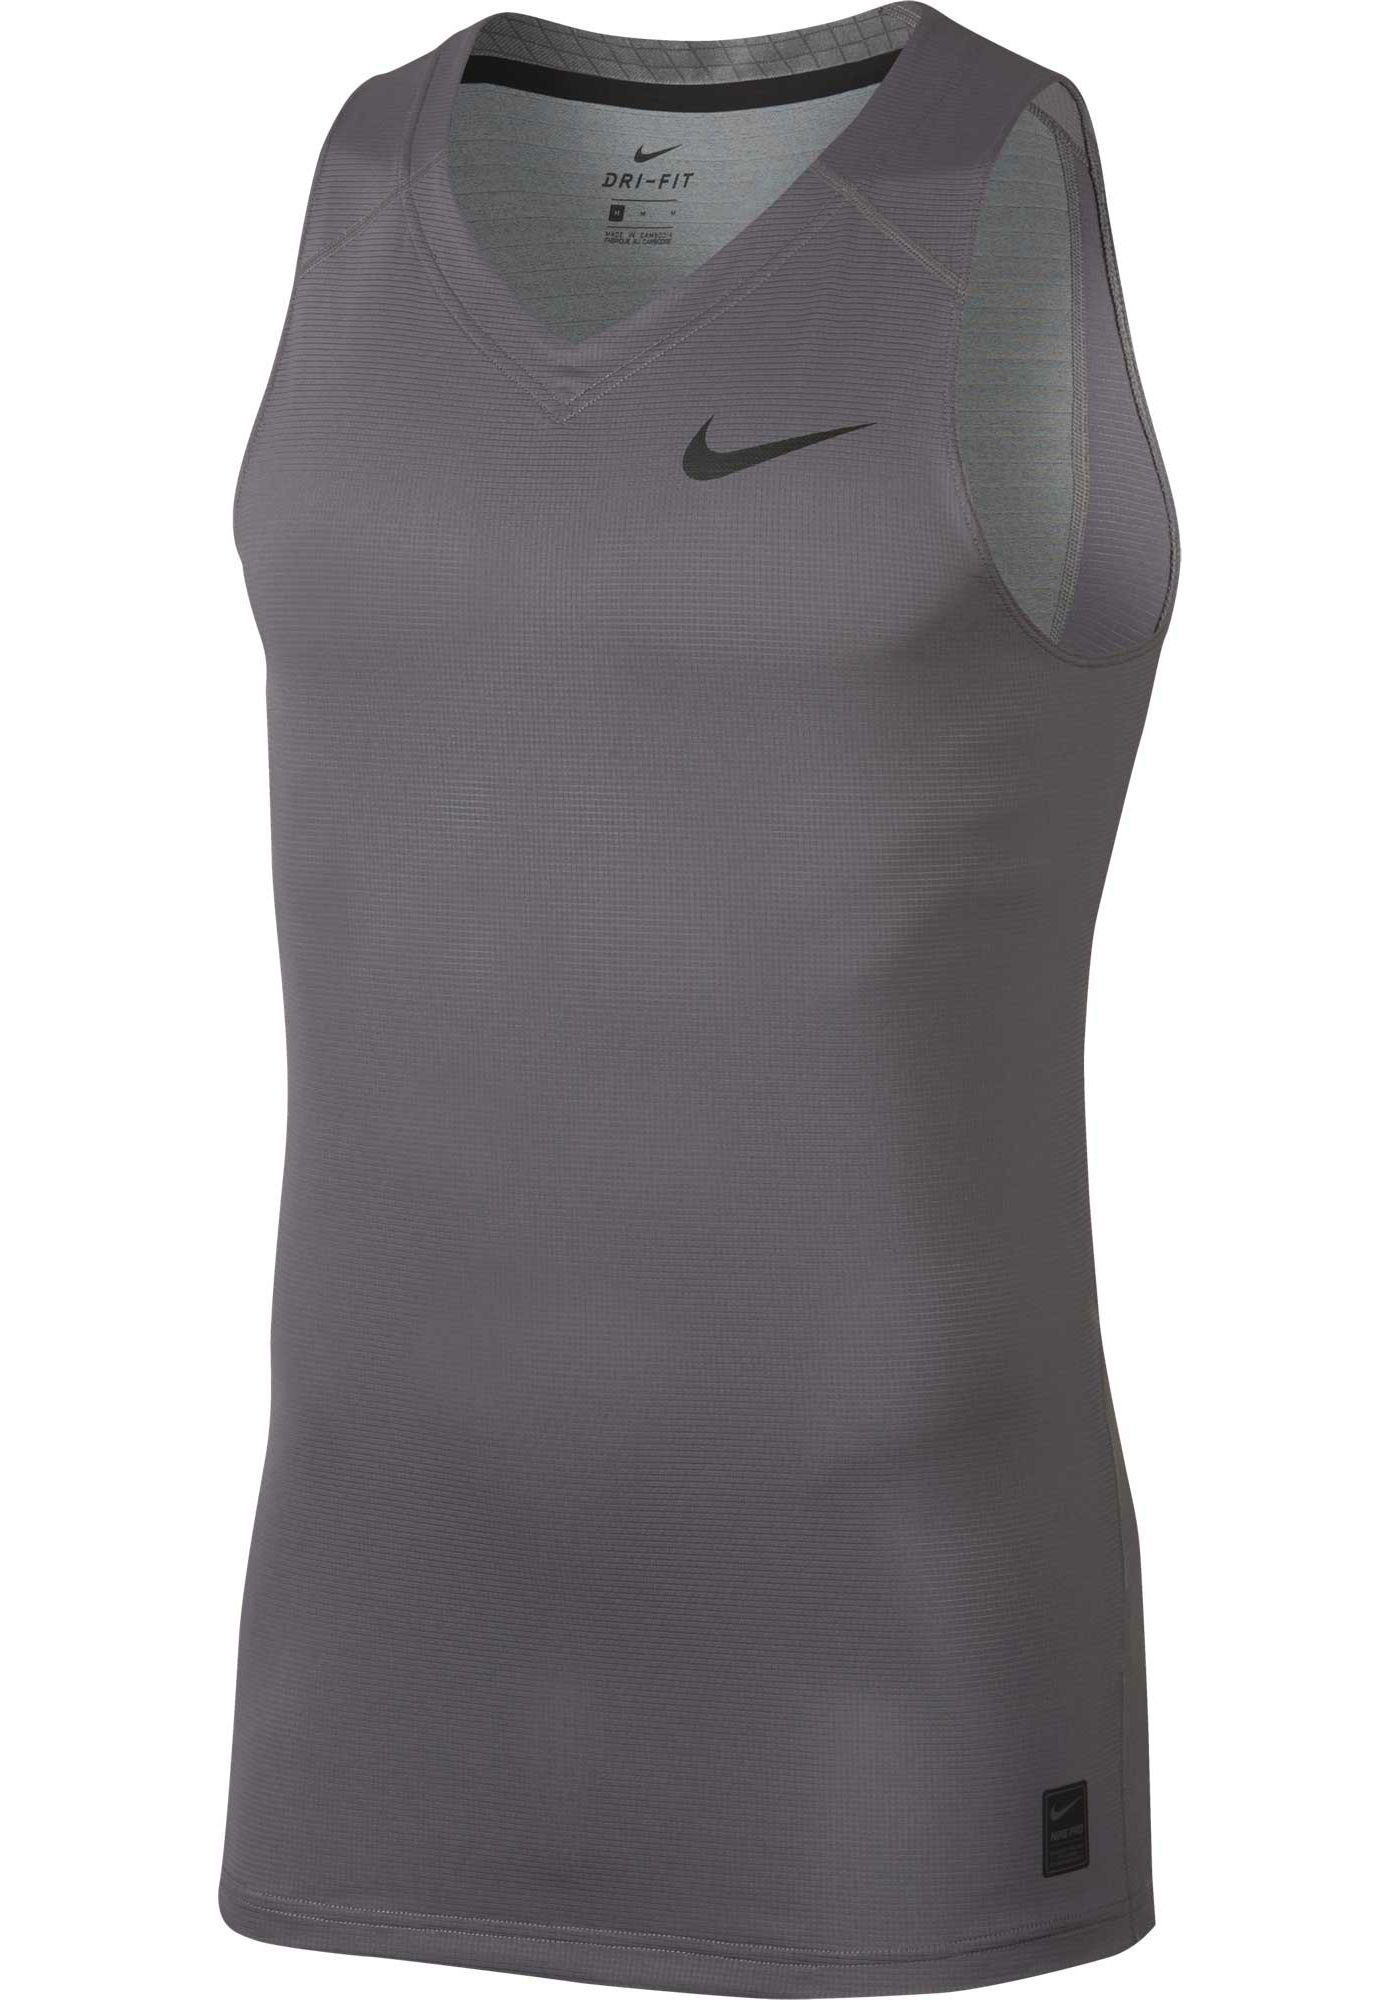 Nike Men's Pro Breathe Tank Top